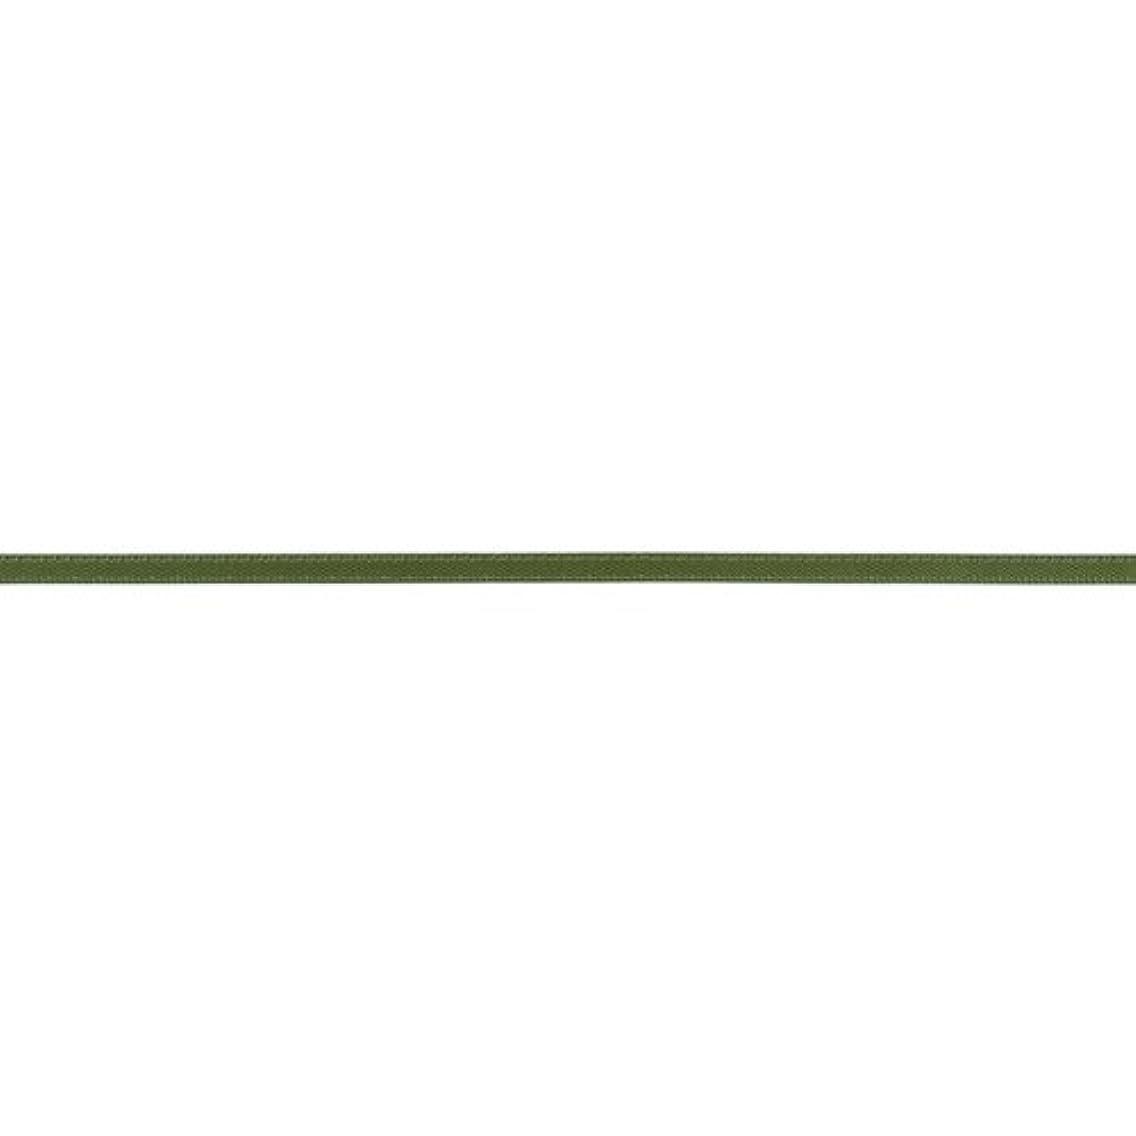 American Crafts 1/8-Inch Satin Ribbon 10-Yard Spool, Olive